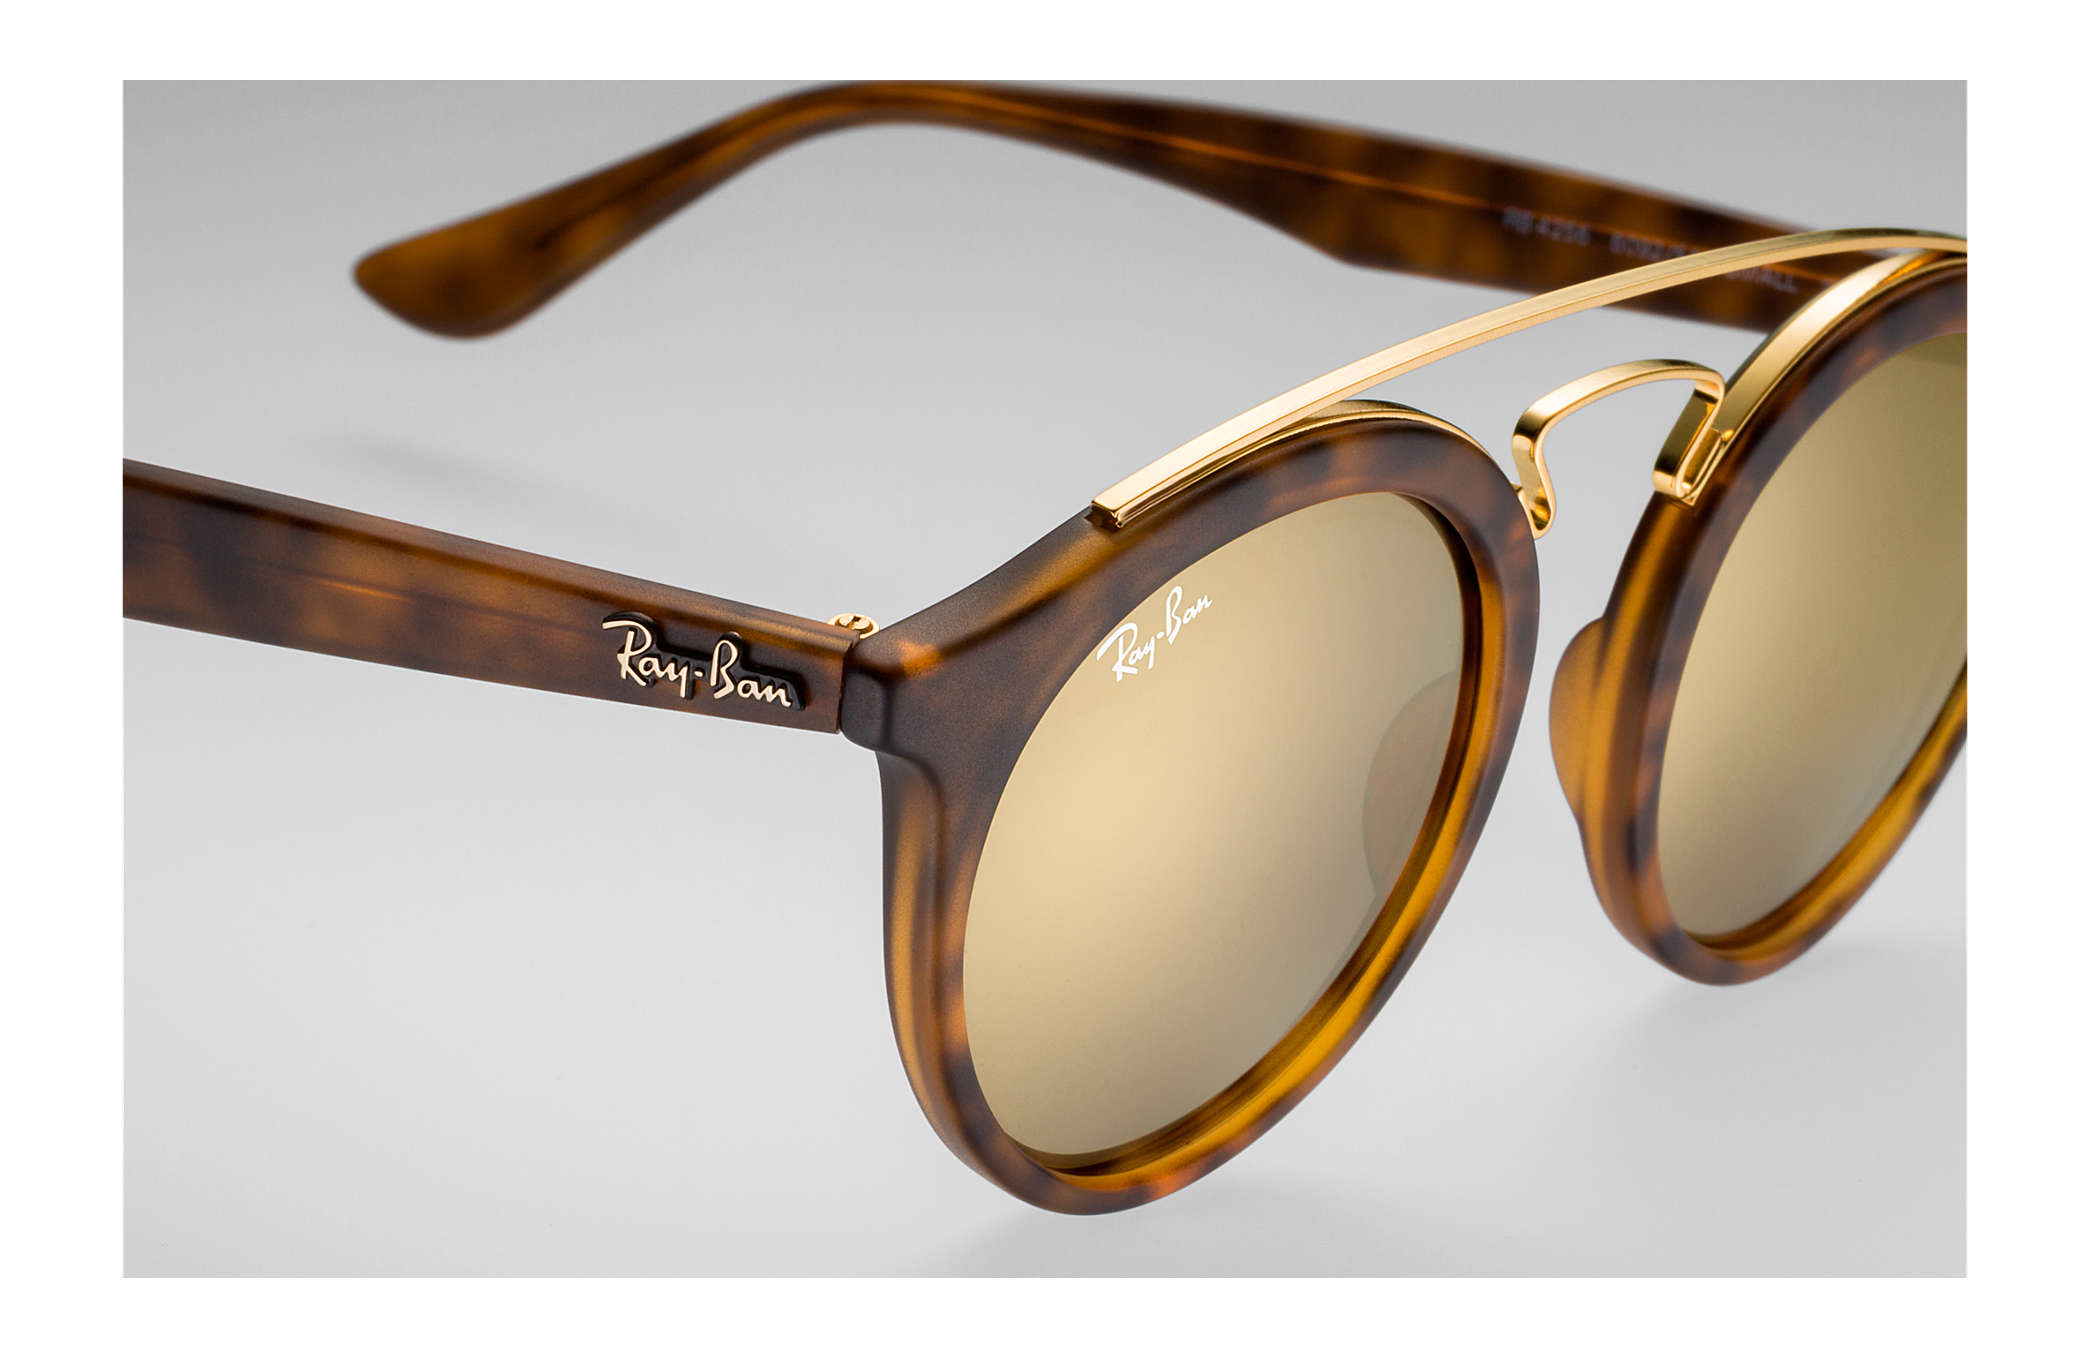 07717f0a25b Ray-Ban Rb4256 Gatsby I RB4256 Tortoise - Propionate - Gold Lenses ...